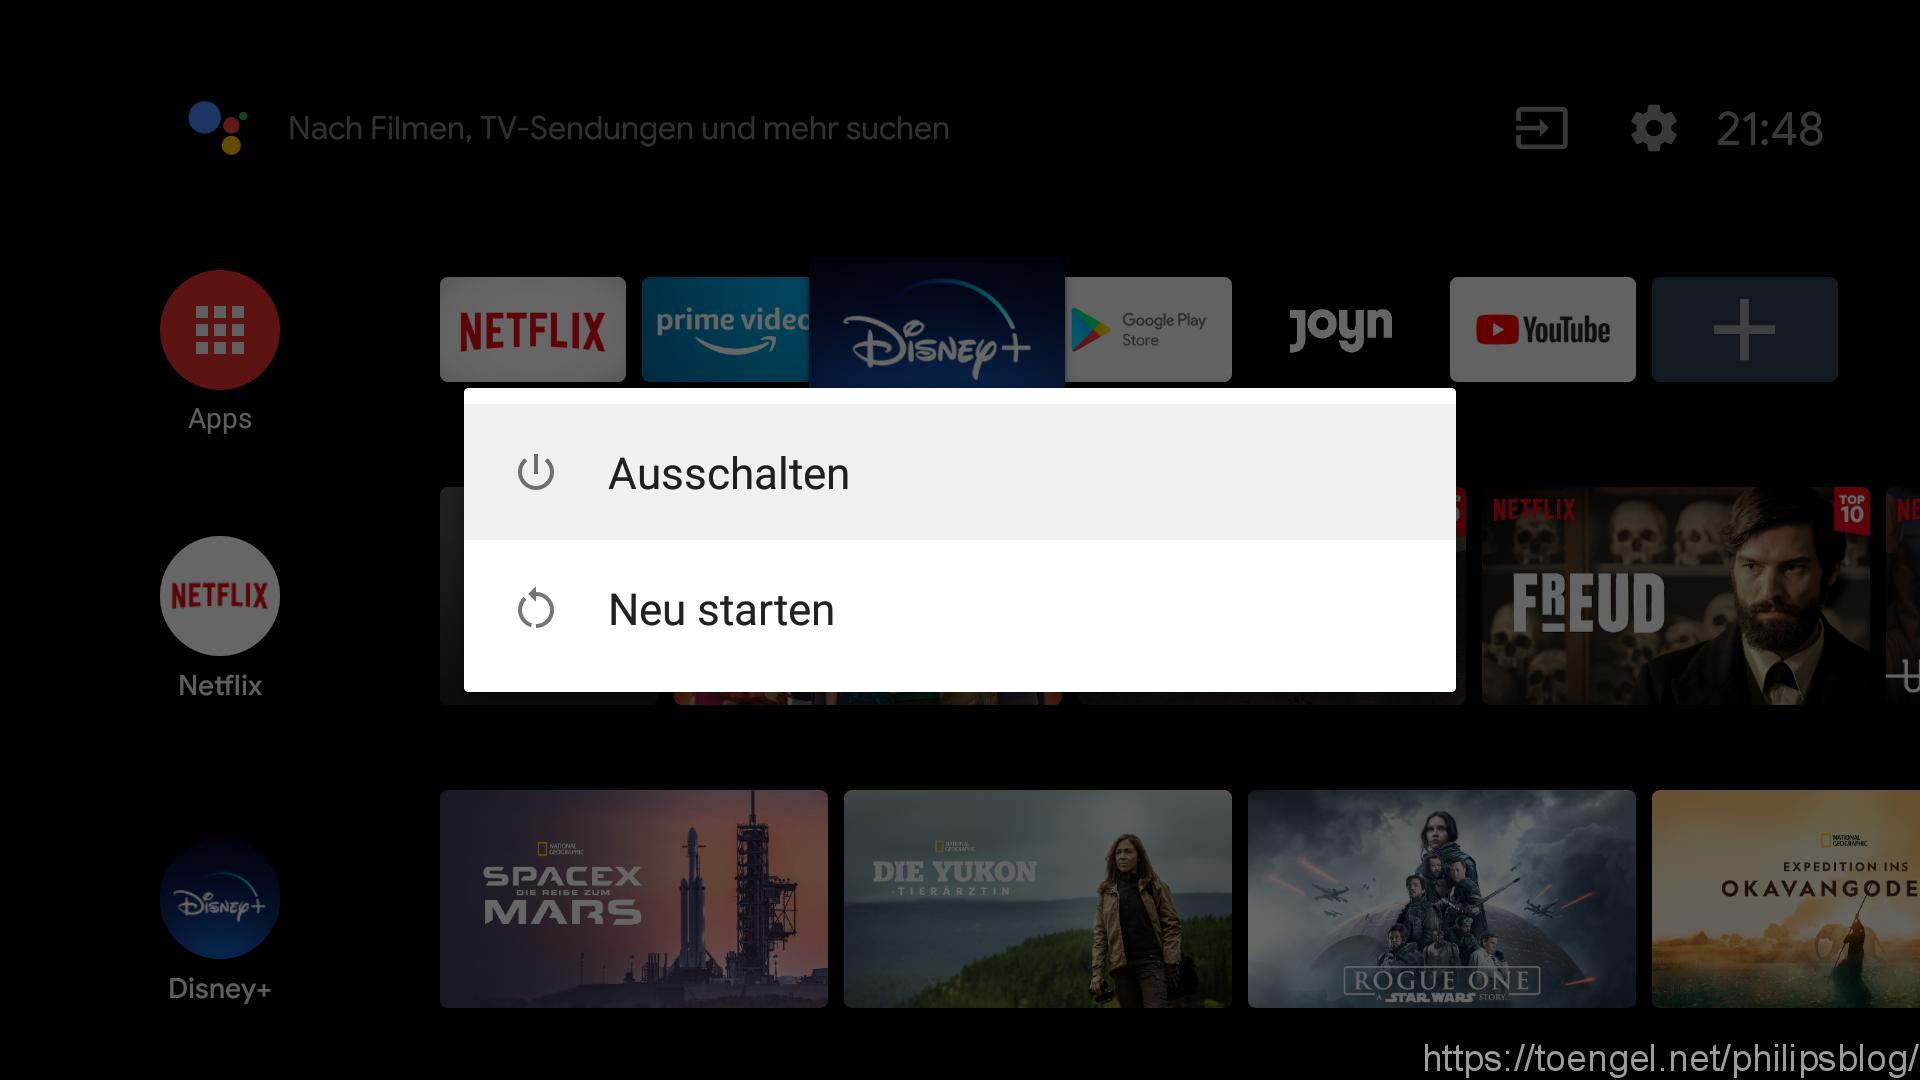 Philips: Android TV Fernbedienung neu belegen - Neustart-Dialog